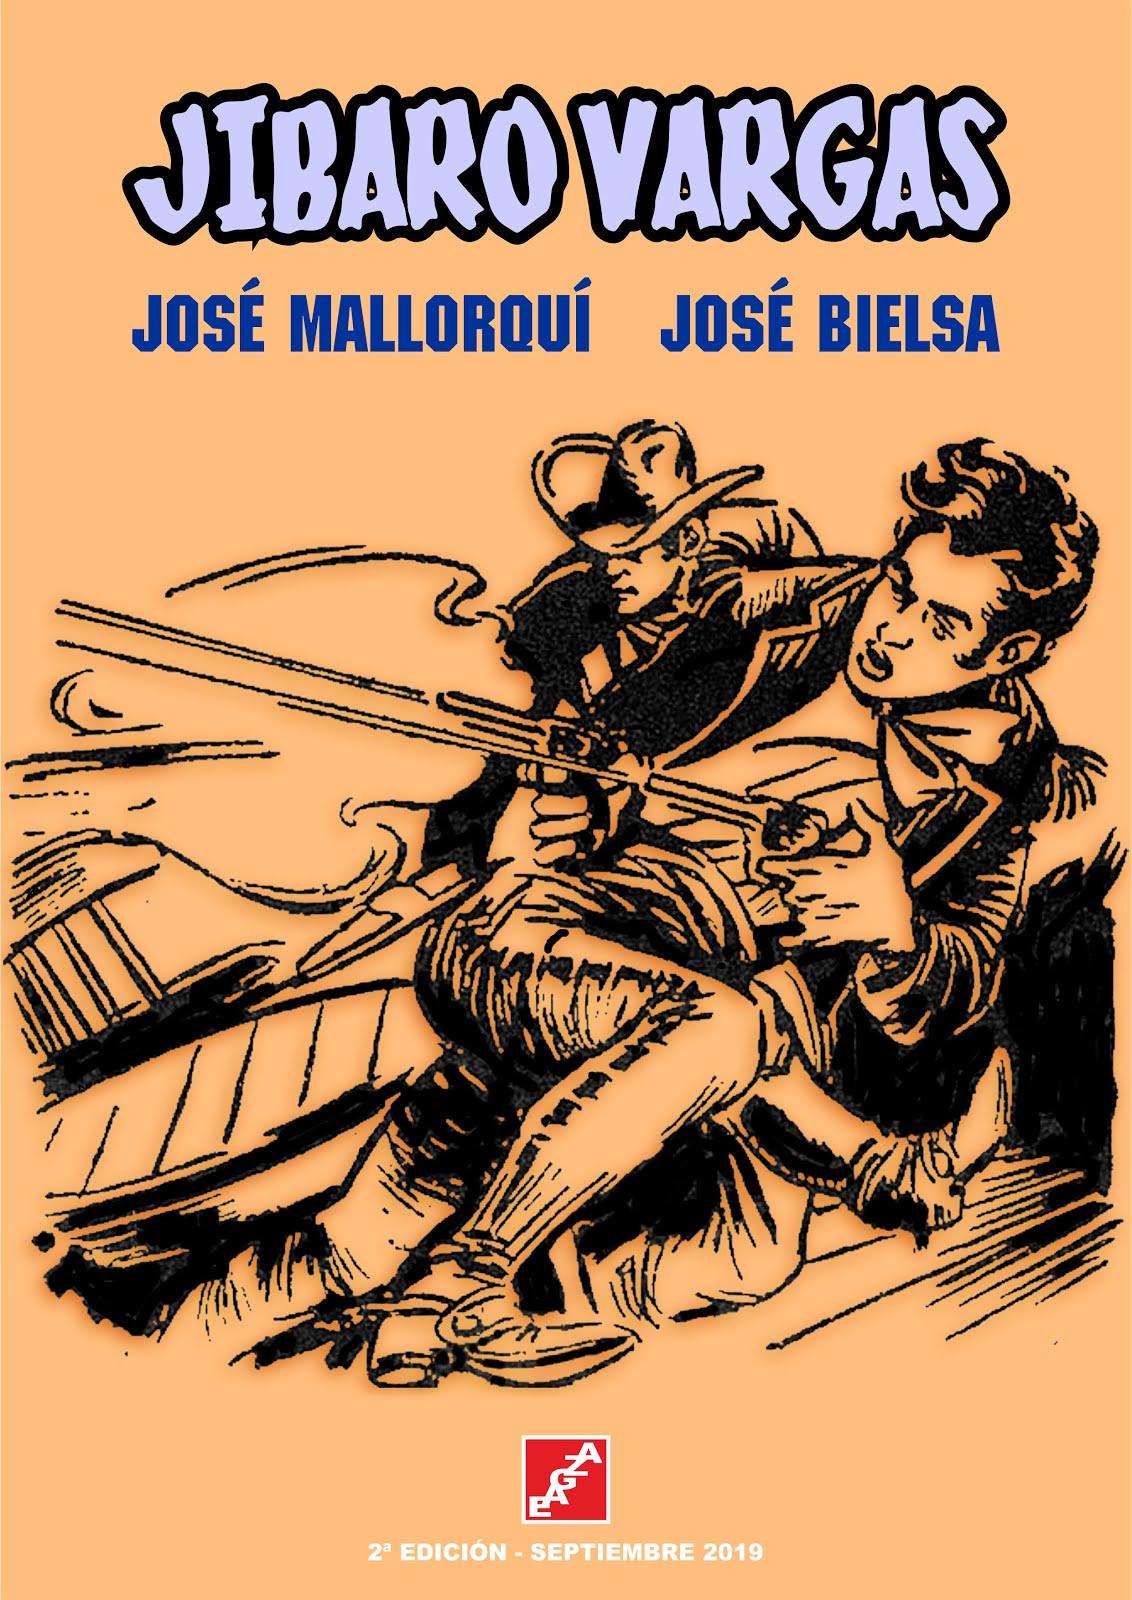 Jibaro Vargas. J. Mallorquí - J. Bielsa. EAGZA